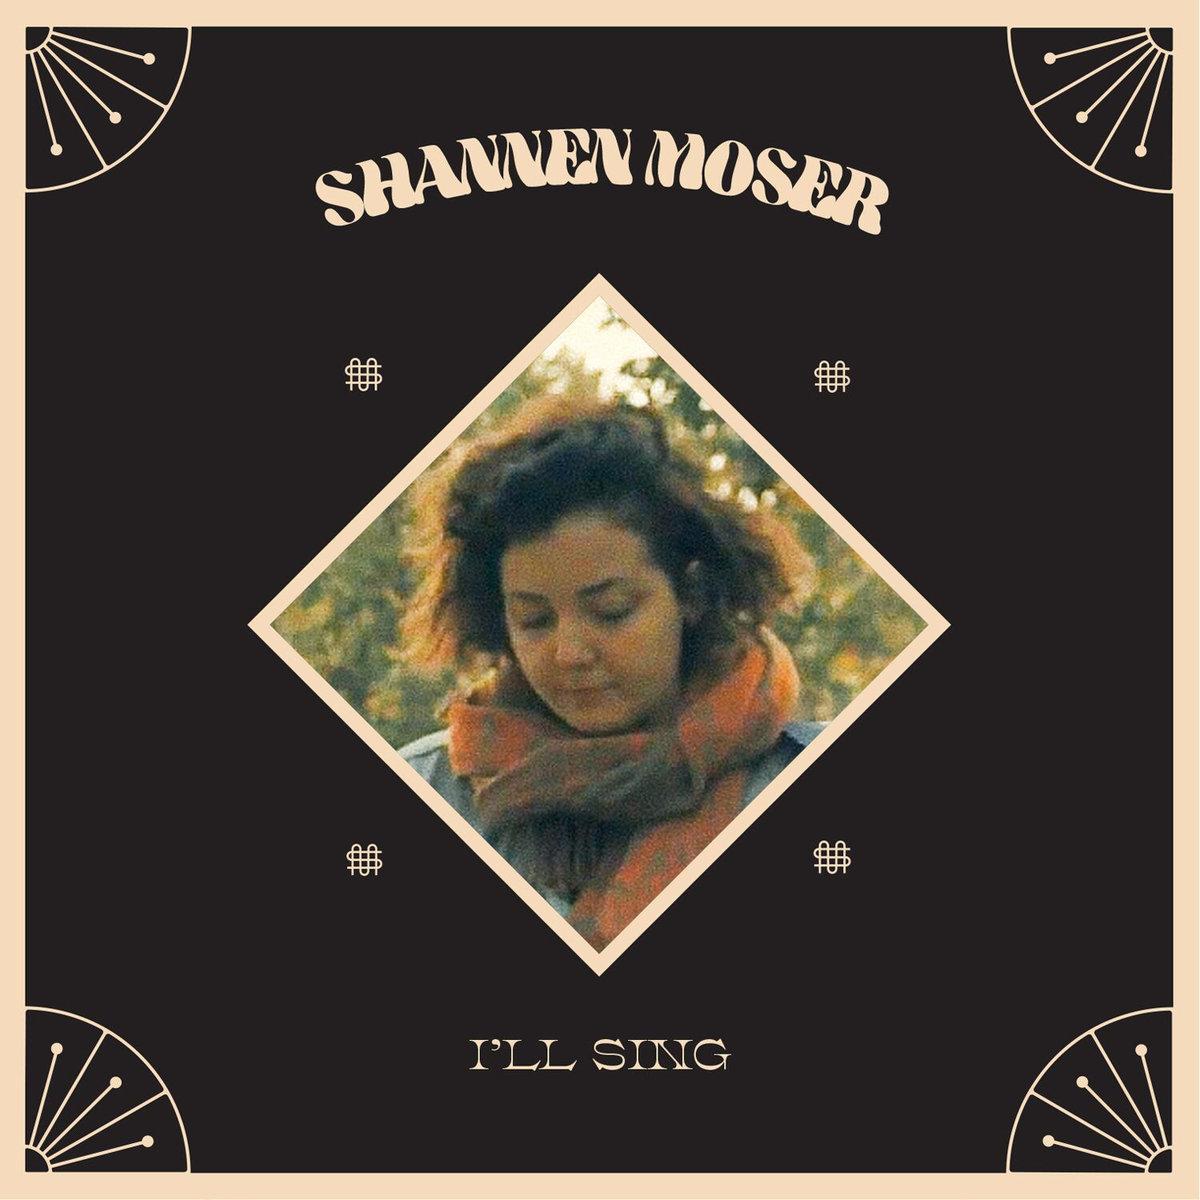 Shannen Moser / I'll Sing(850 Ltd LP)